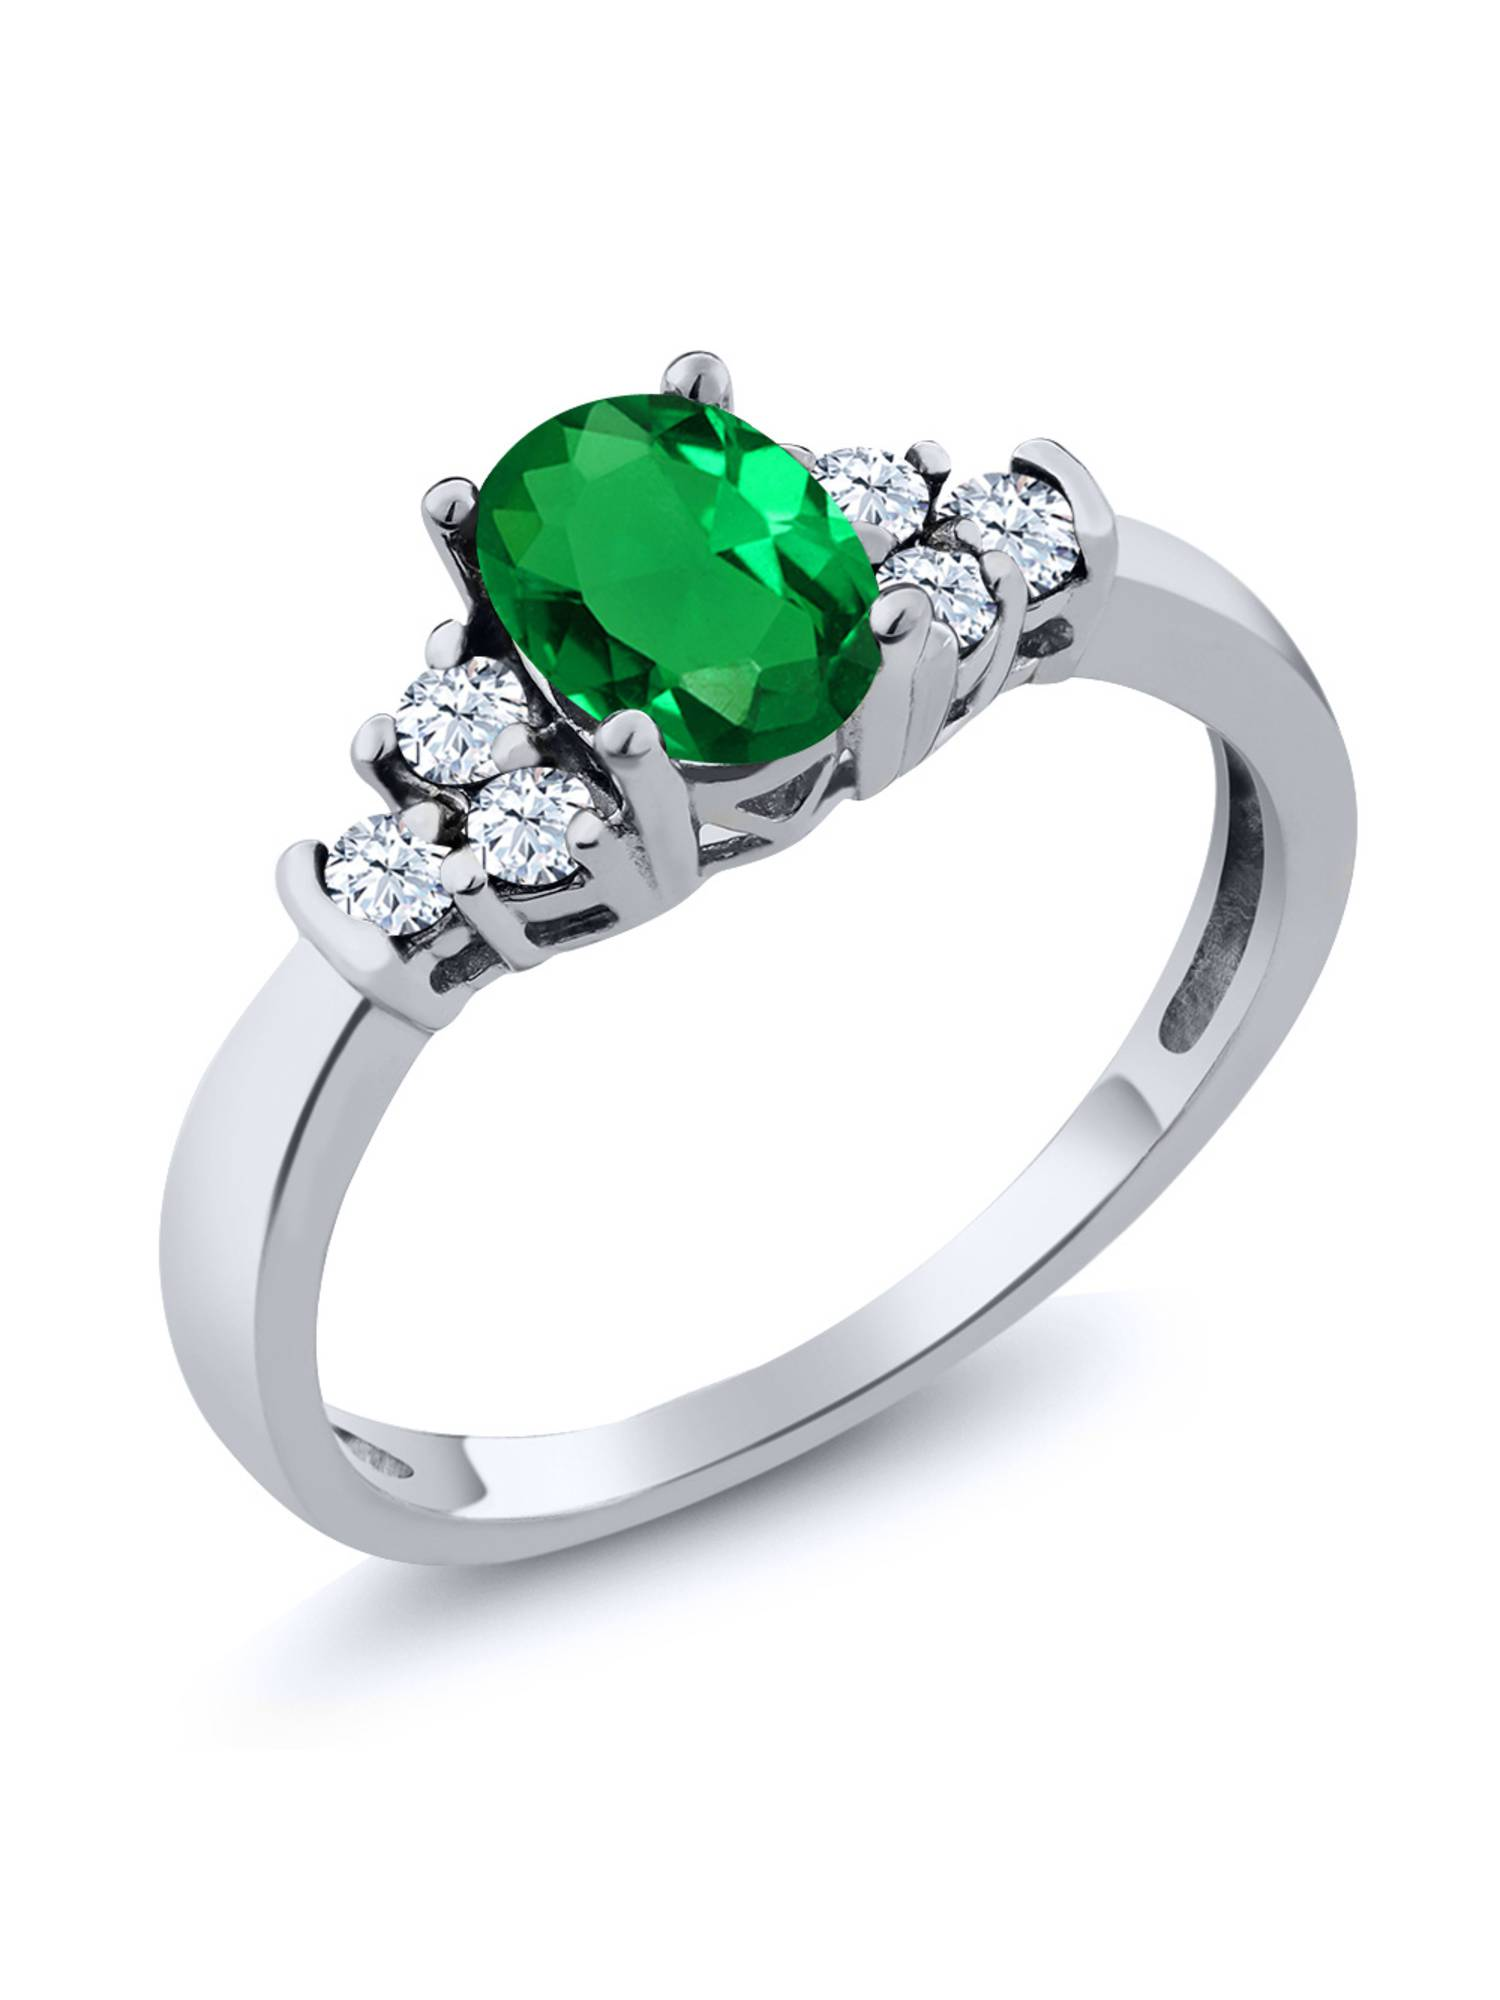 0.64 Ct Oval Green Nano Emerald White Topaz 925 Sterling Silver Ring